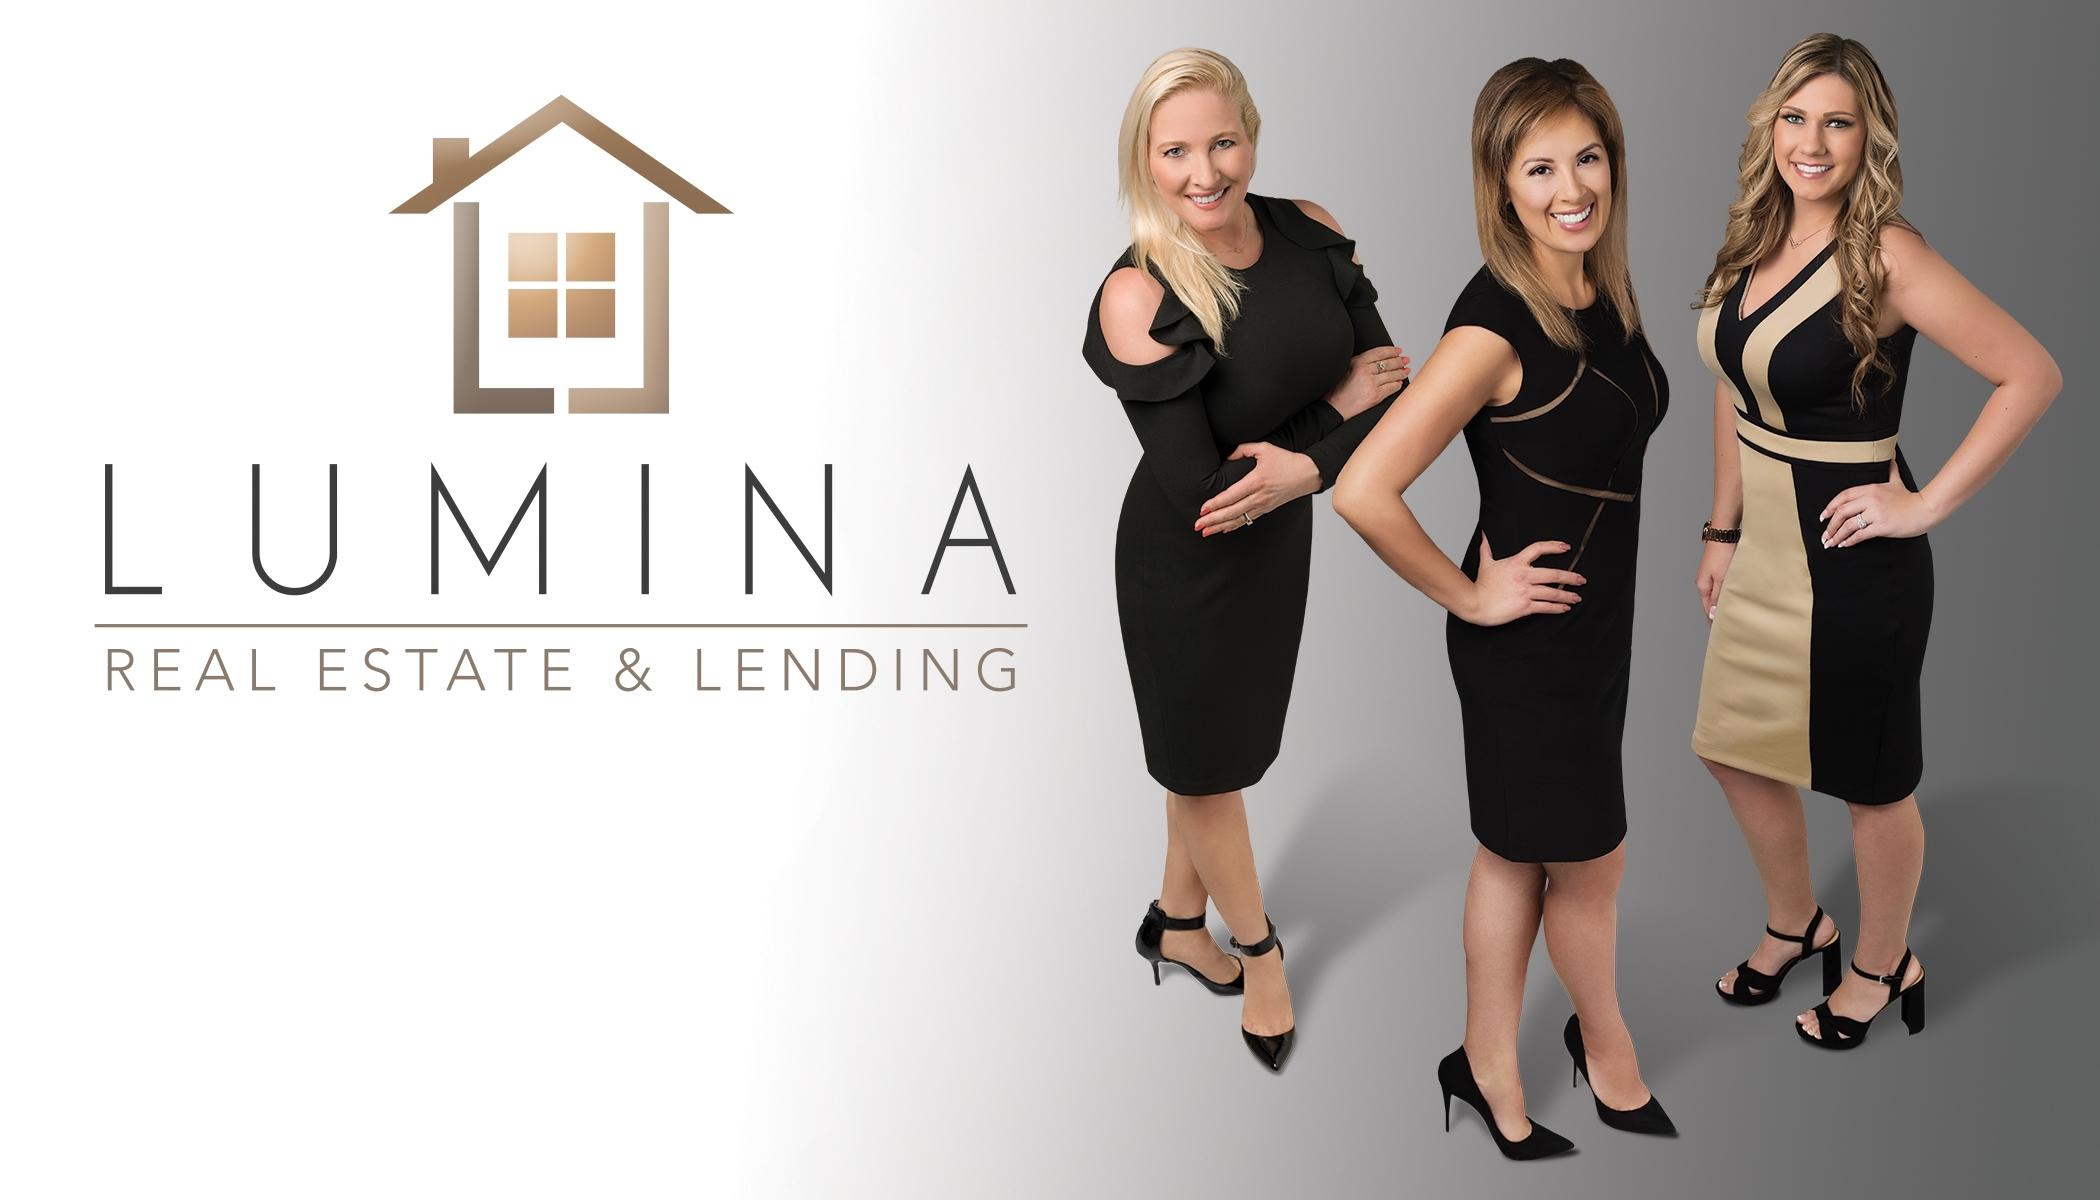 Lumina Real Estate & Lending